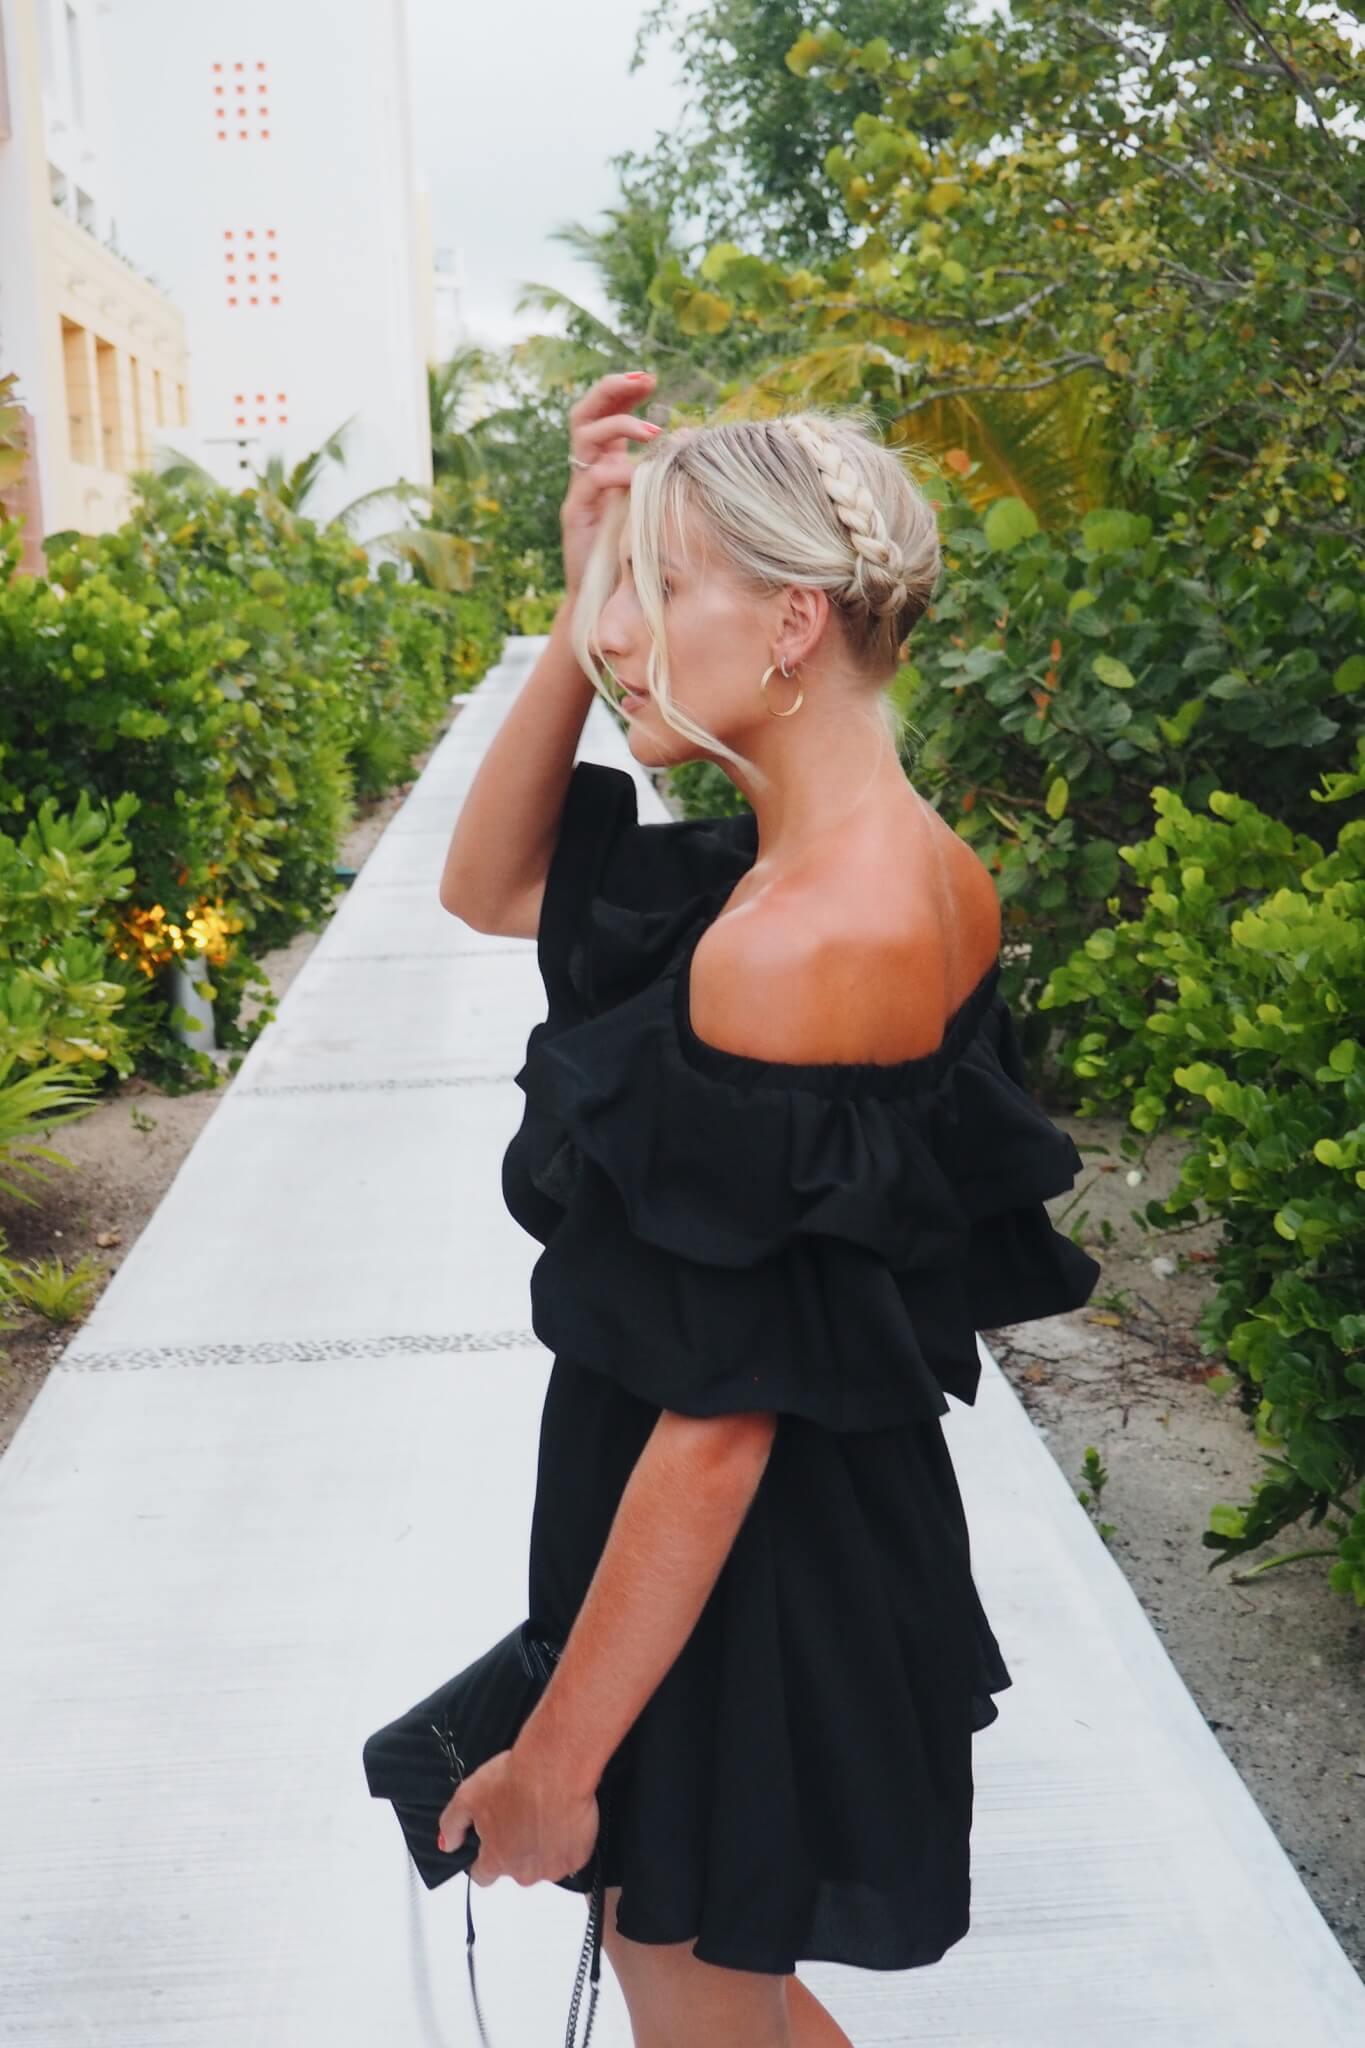 holiday outfits on uk fashion blog